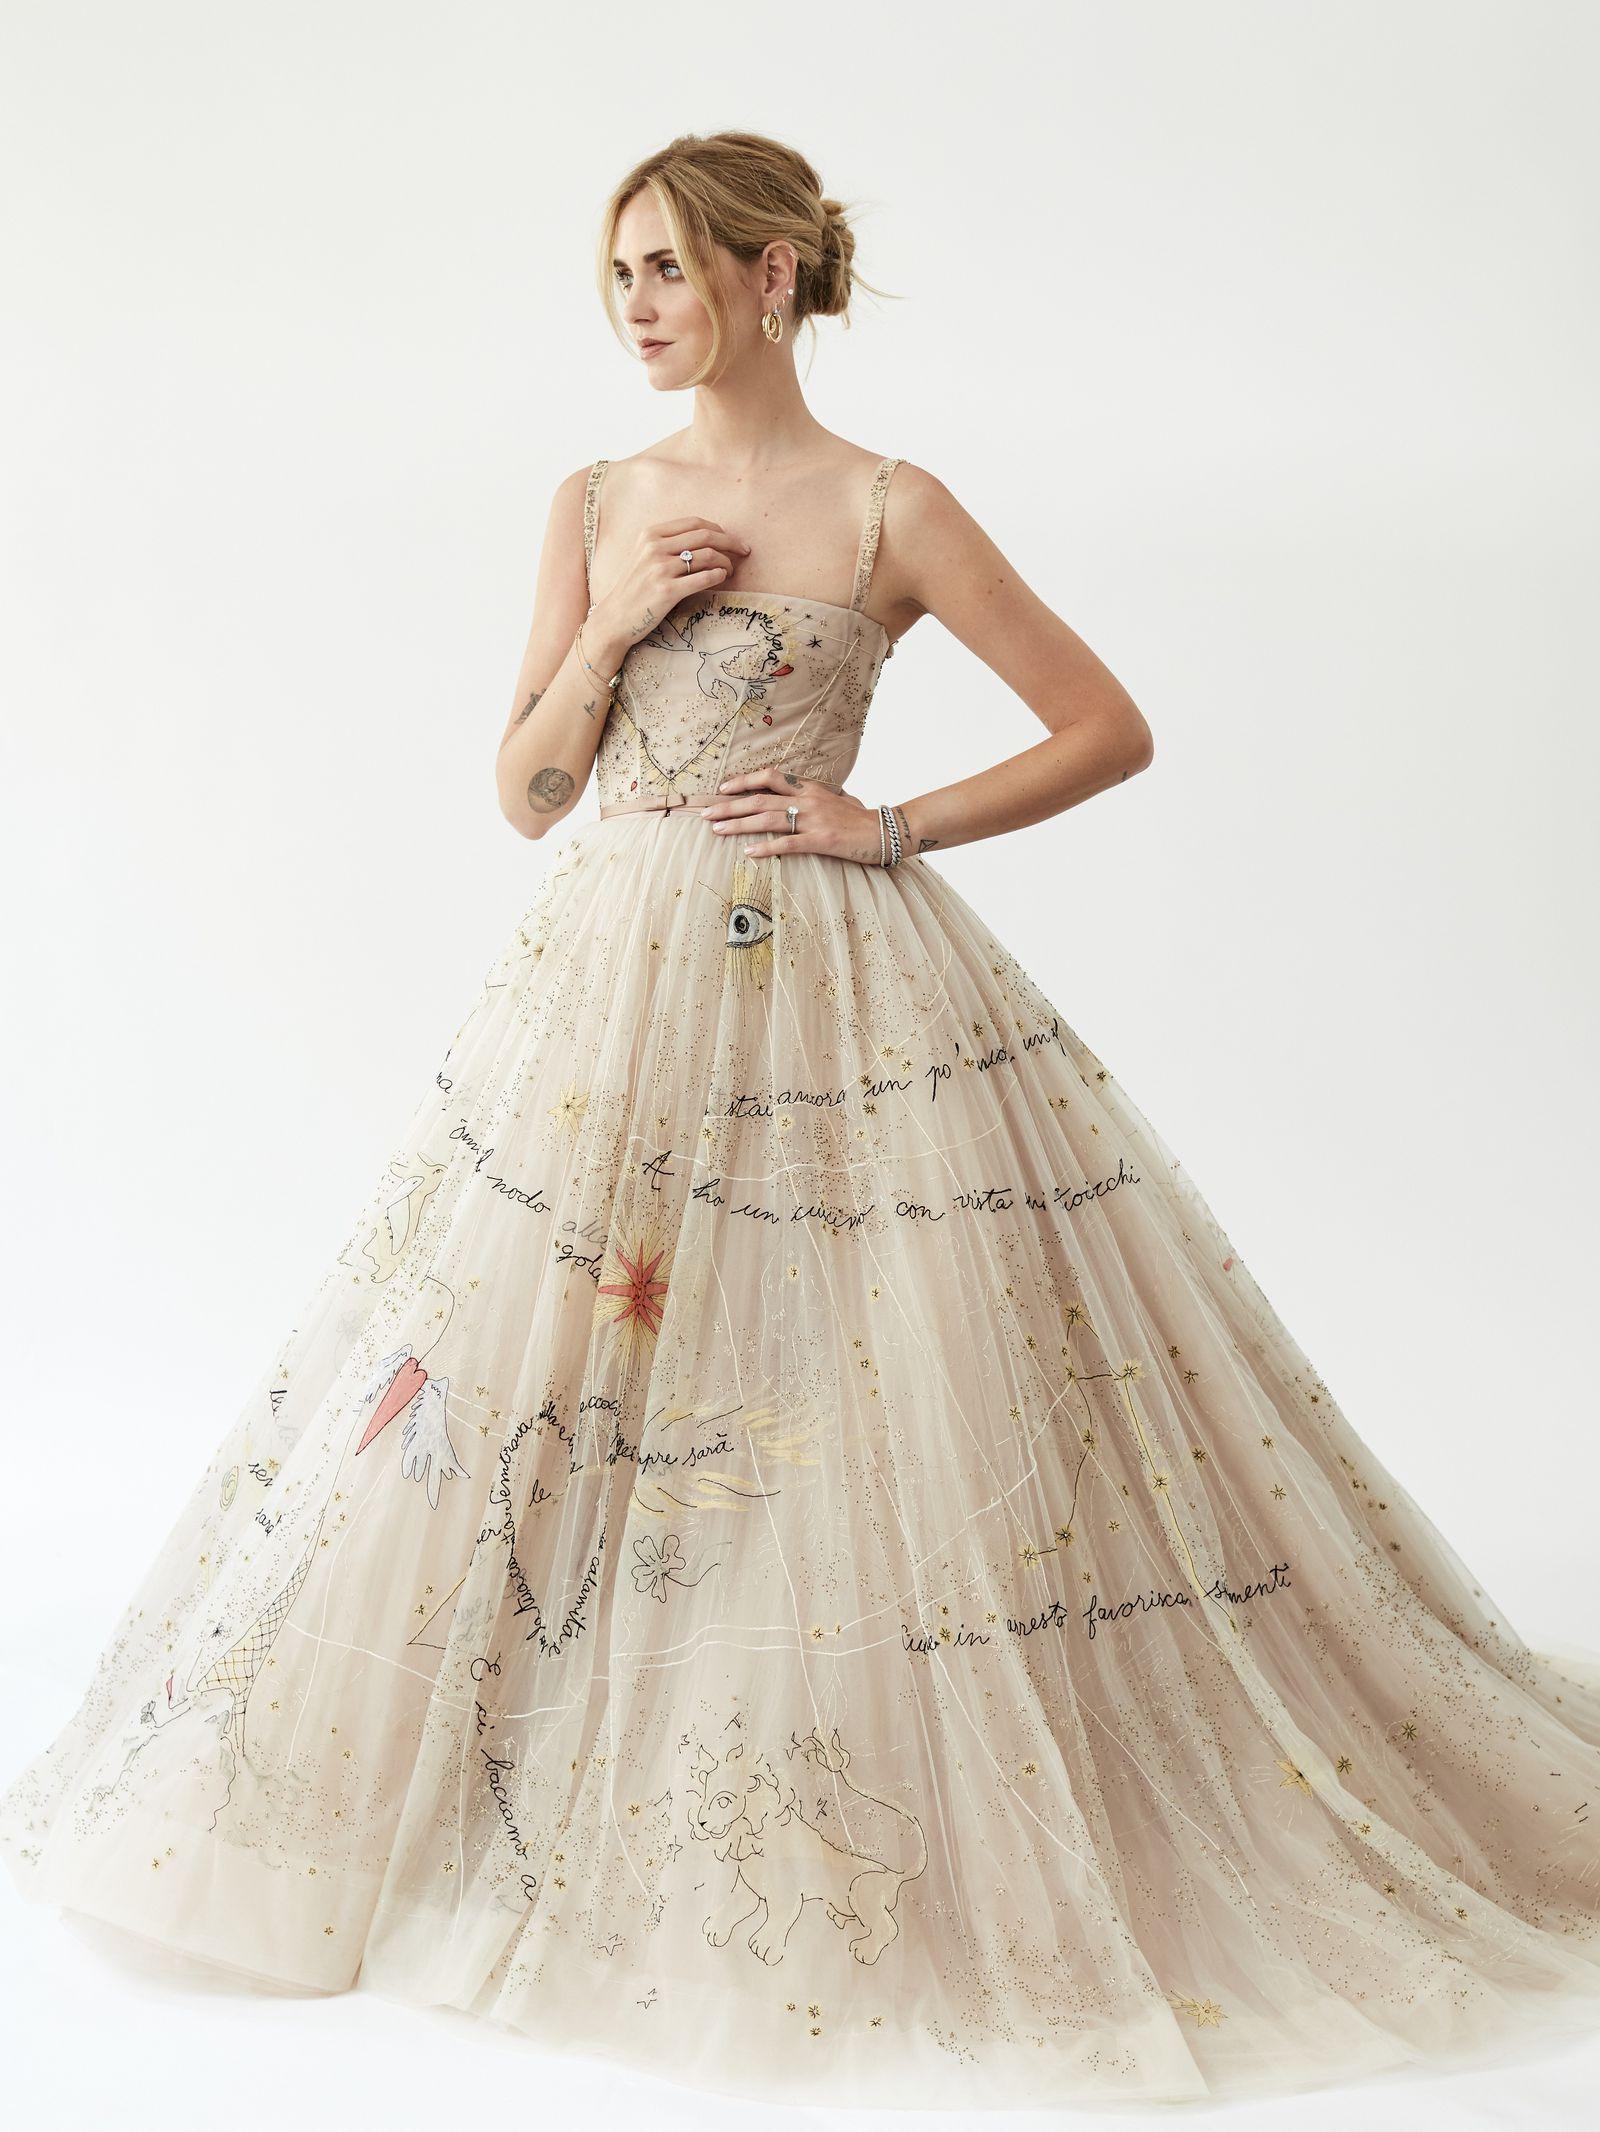 3ee3c518ff Chiara Ferragni's Wedding Dress Is More Influential than Meghan Markle's-  HarpersBAZAAR.com